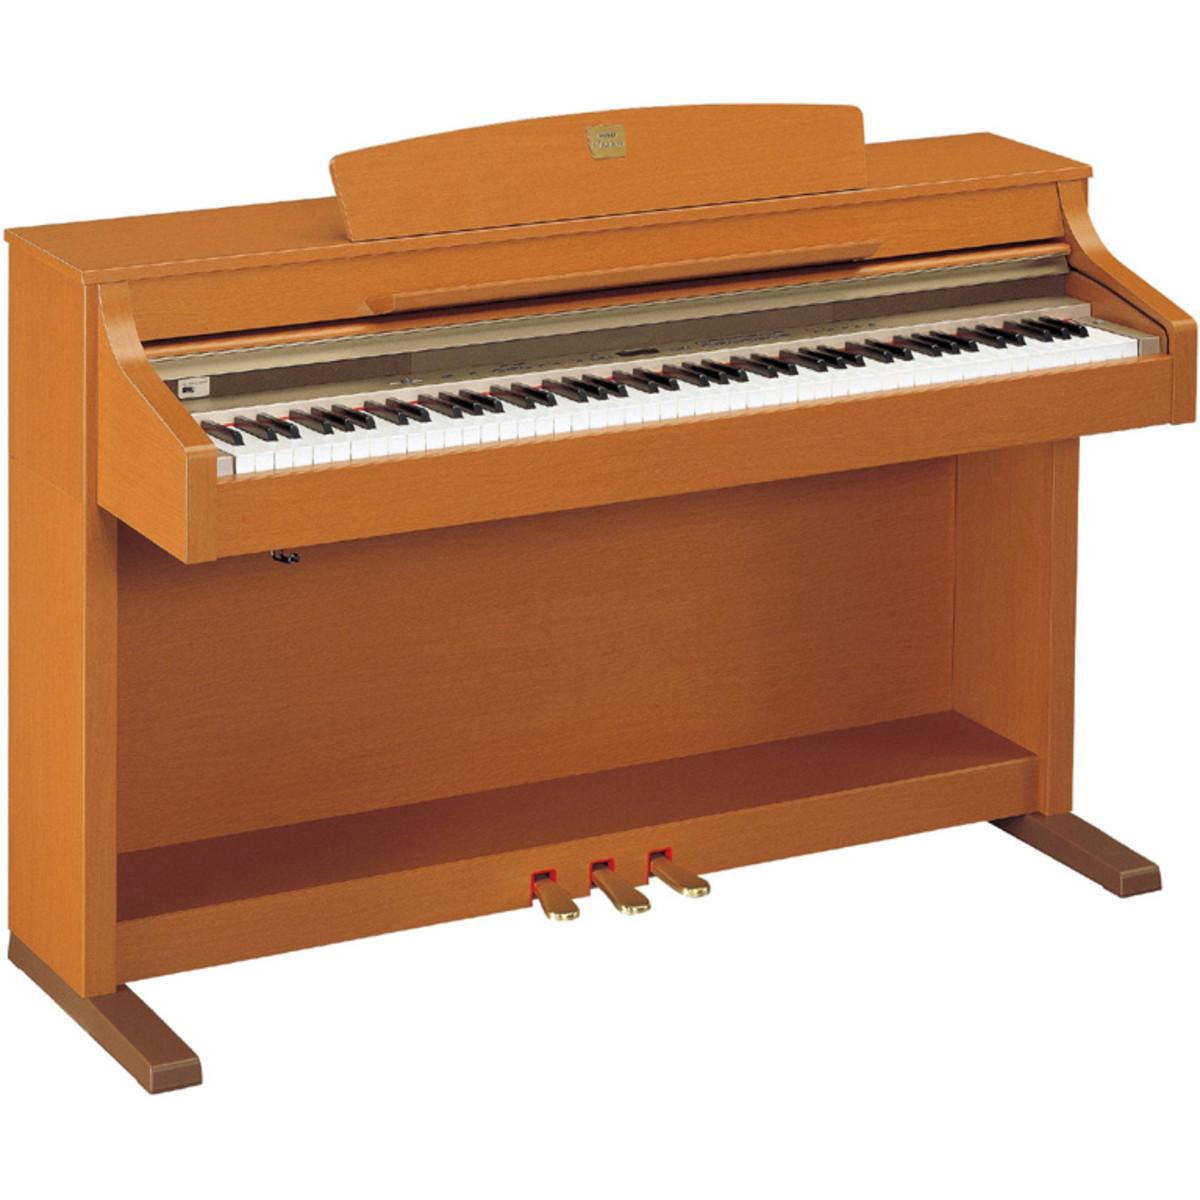 Disc yamaha clavinova clp330c cherry at for Yamaha dgx640c digital piano cherry